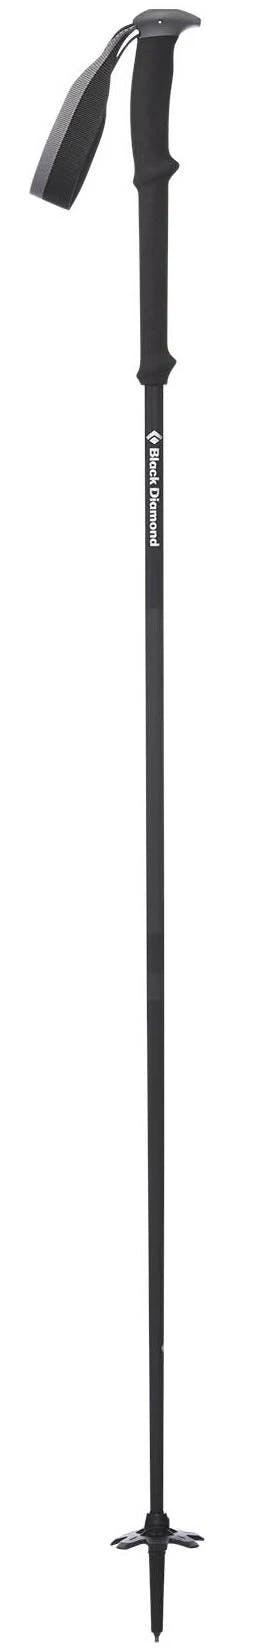 Black Diamond Vapor Carbon Ski Poles 125 Cm